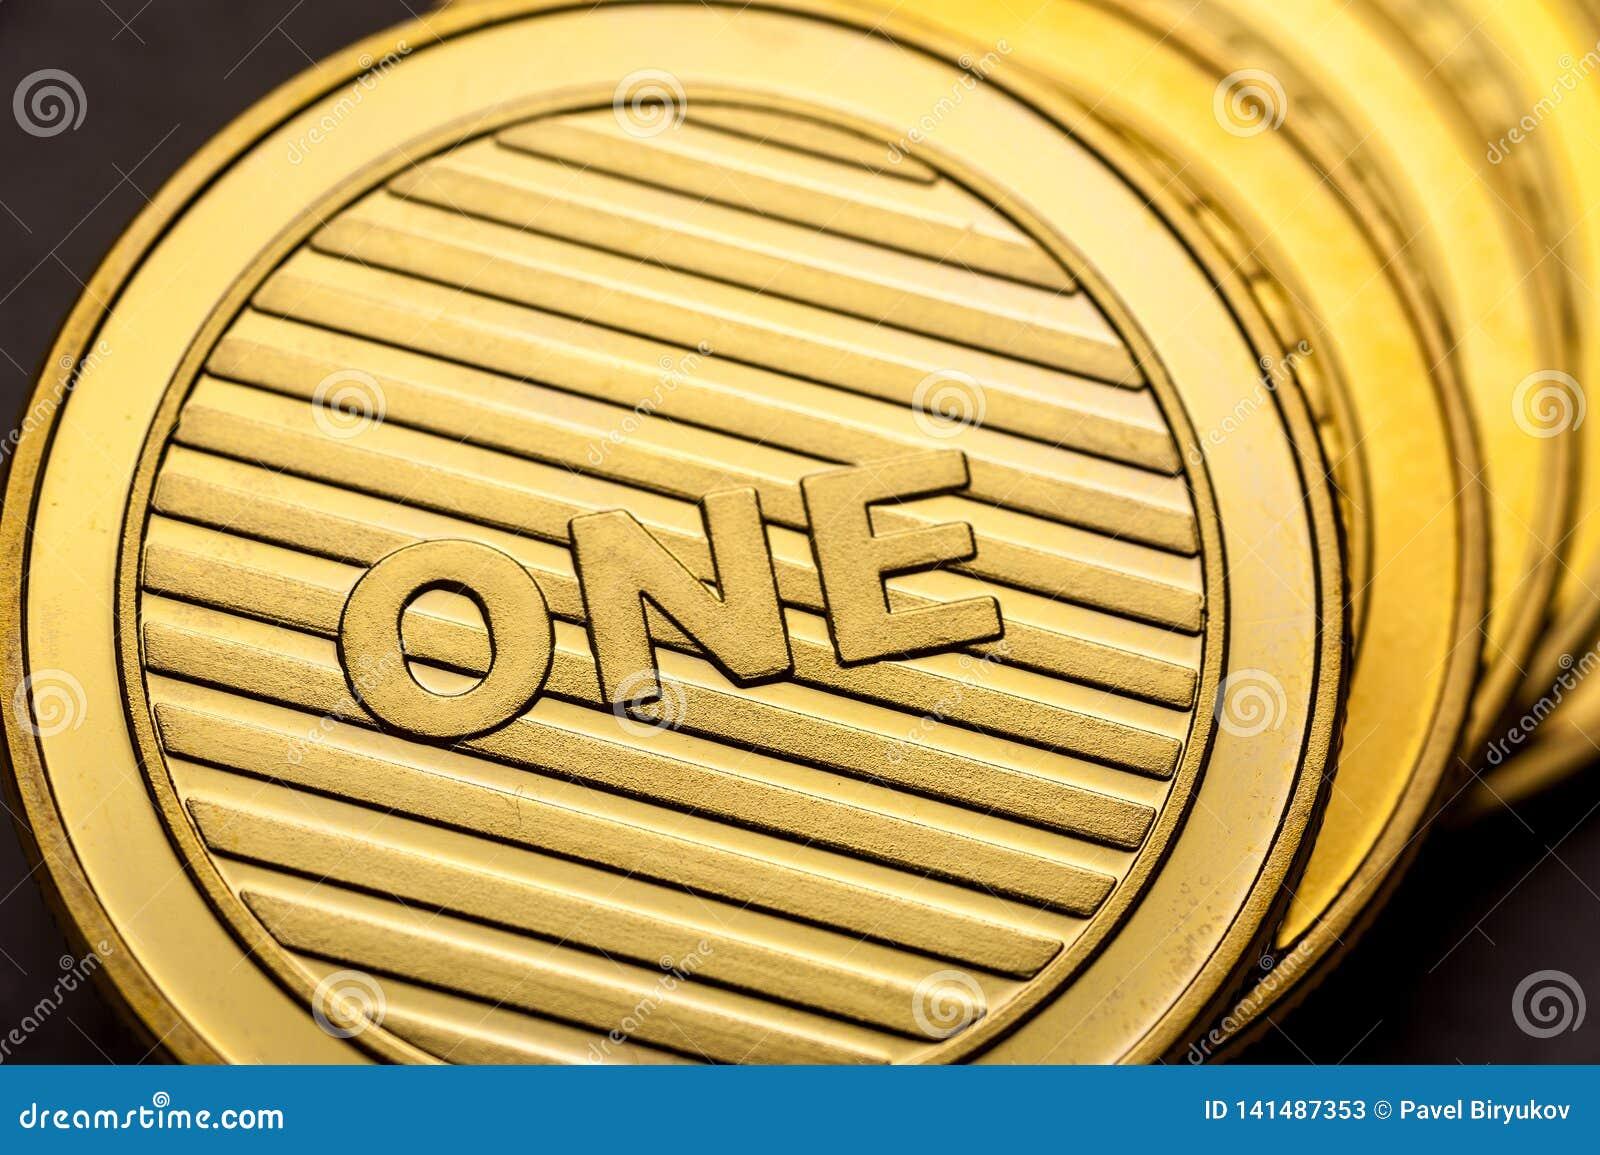 Cryptocurrency, технология blockchain, электронная коммерция